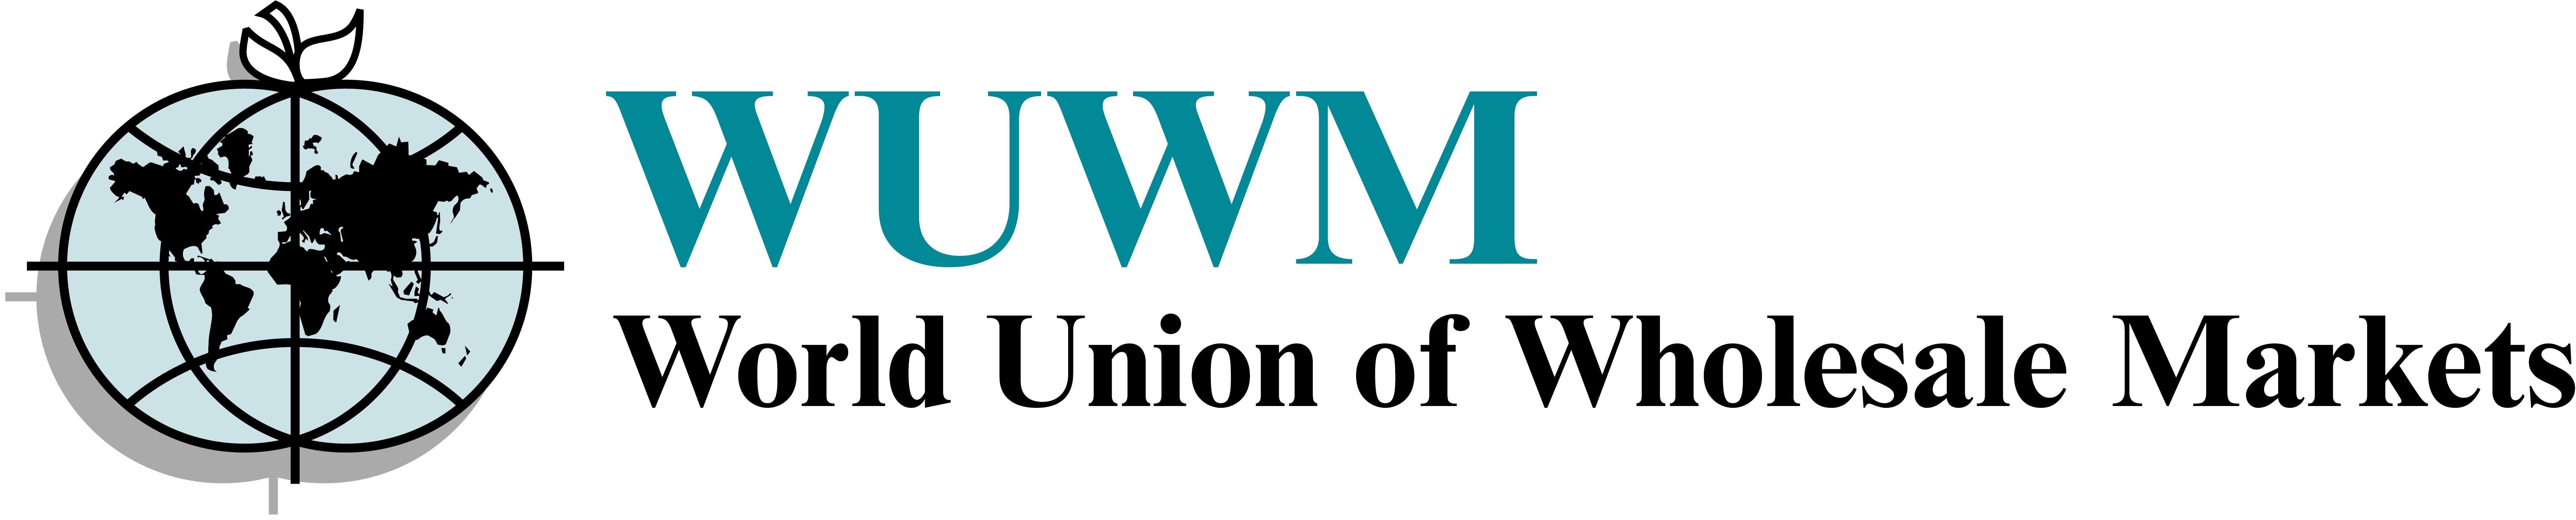 logo for World Union of Wholesale Markets